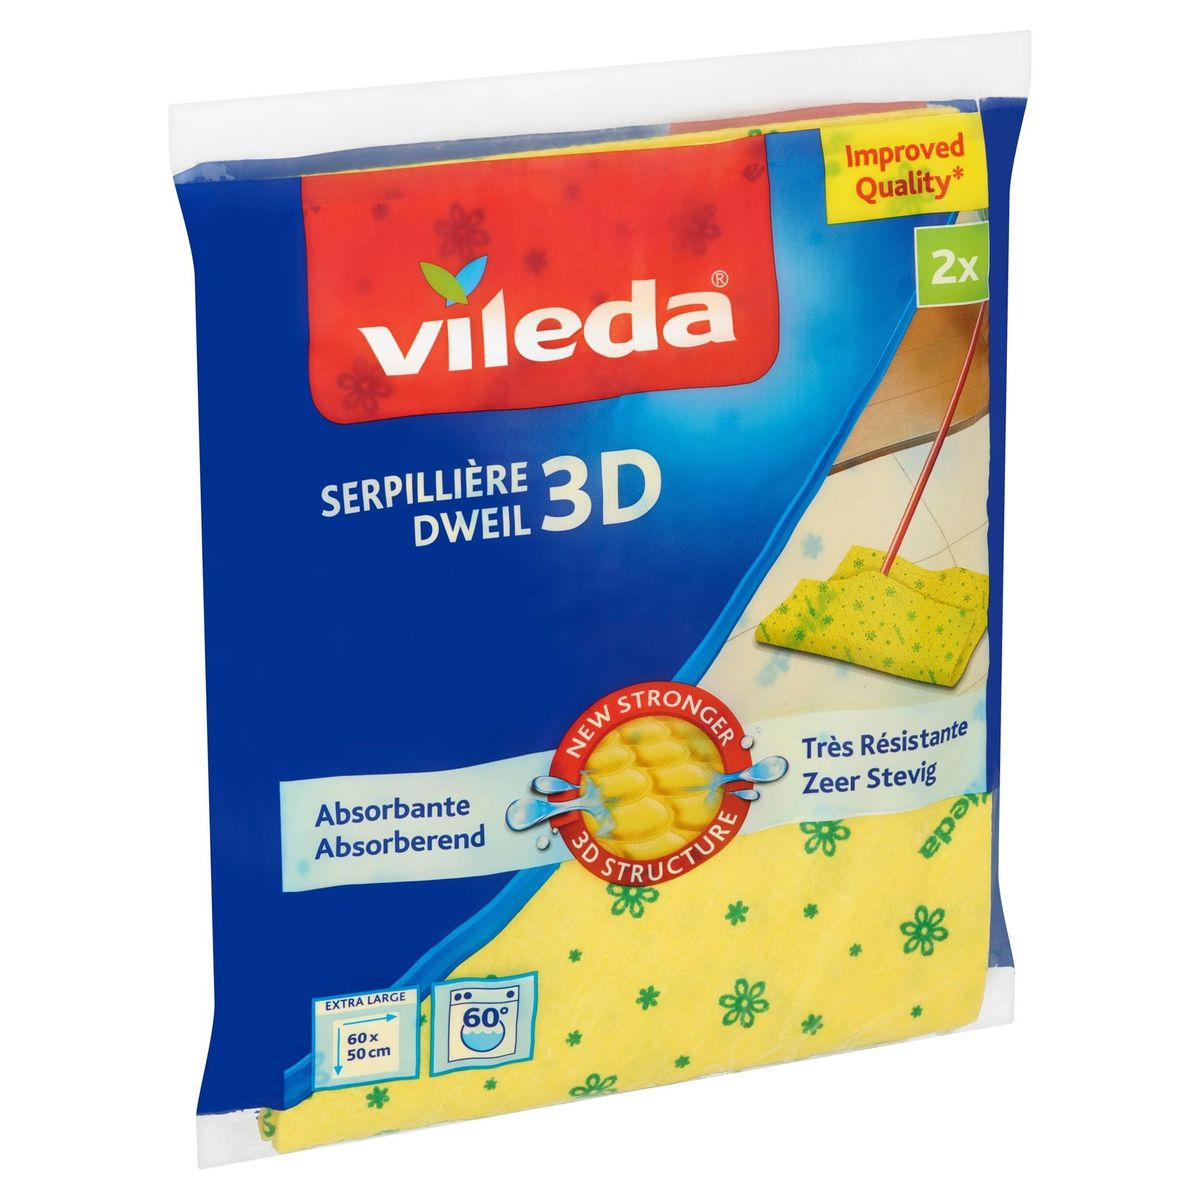 Vileda Dweil 3D 2 Stuks